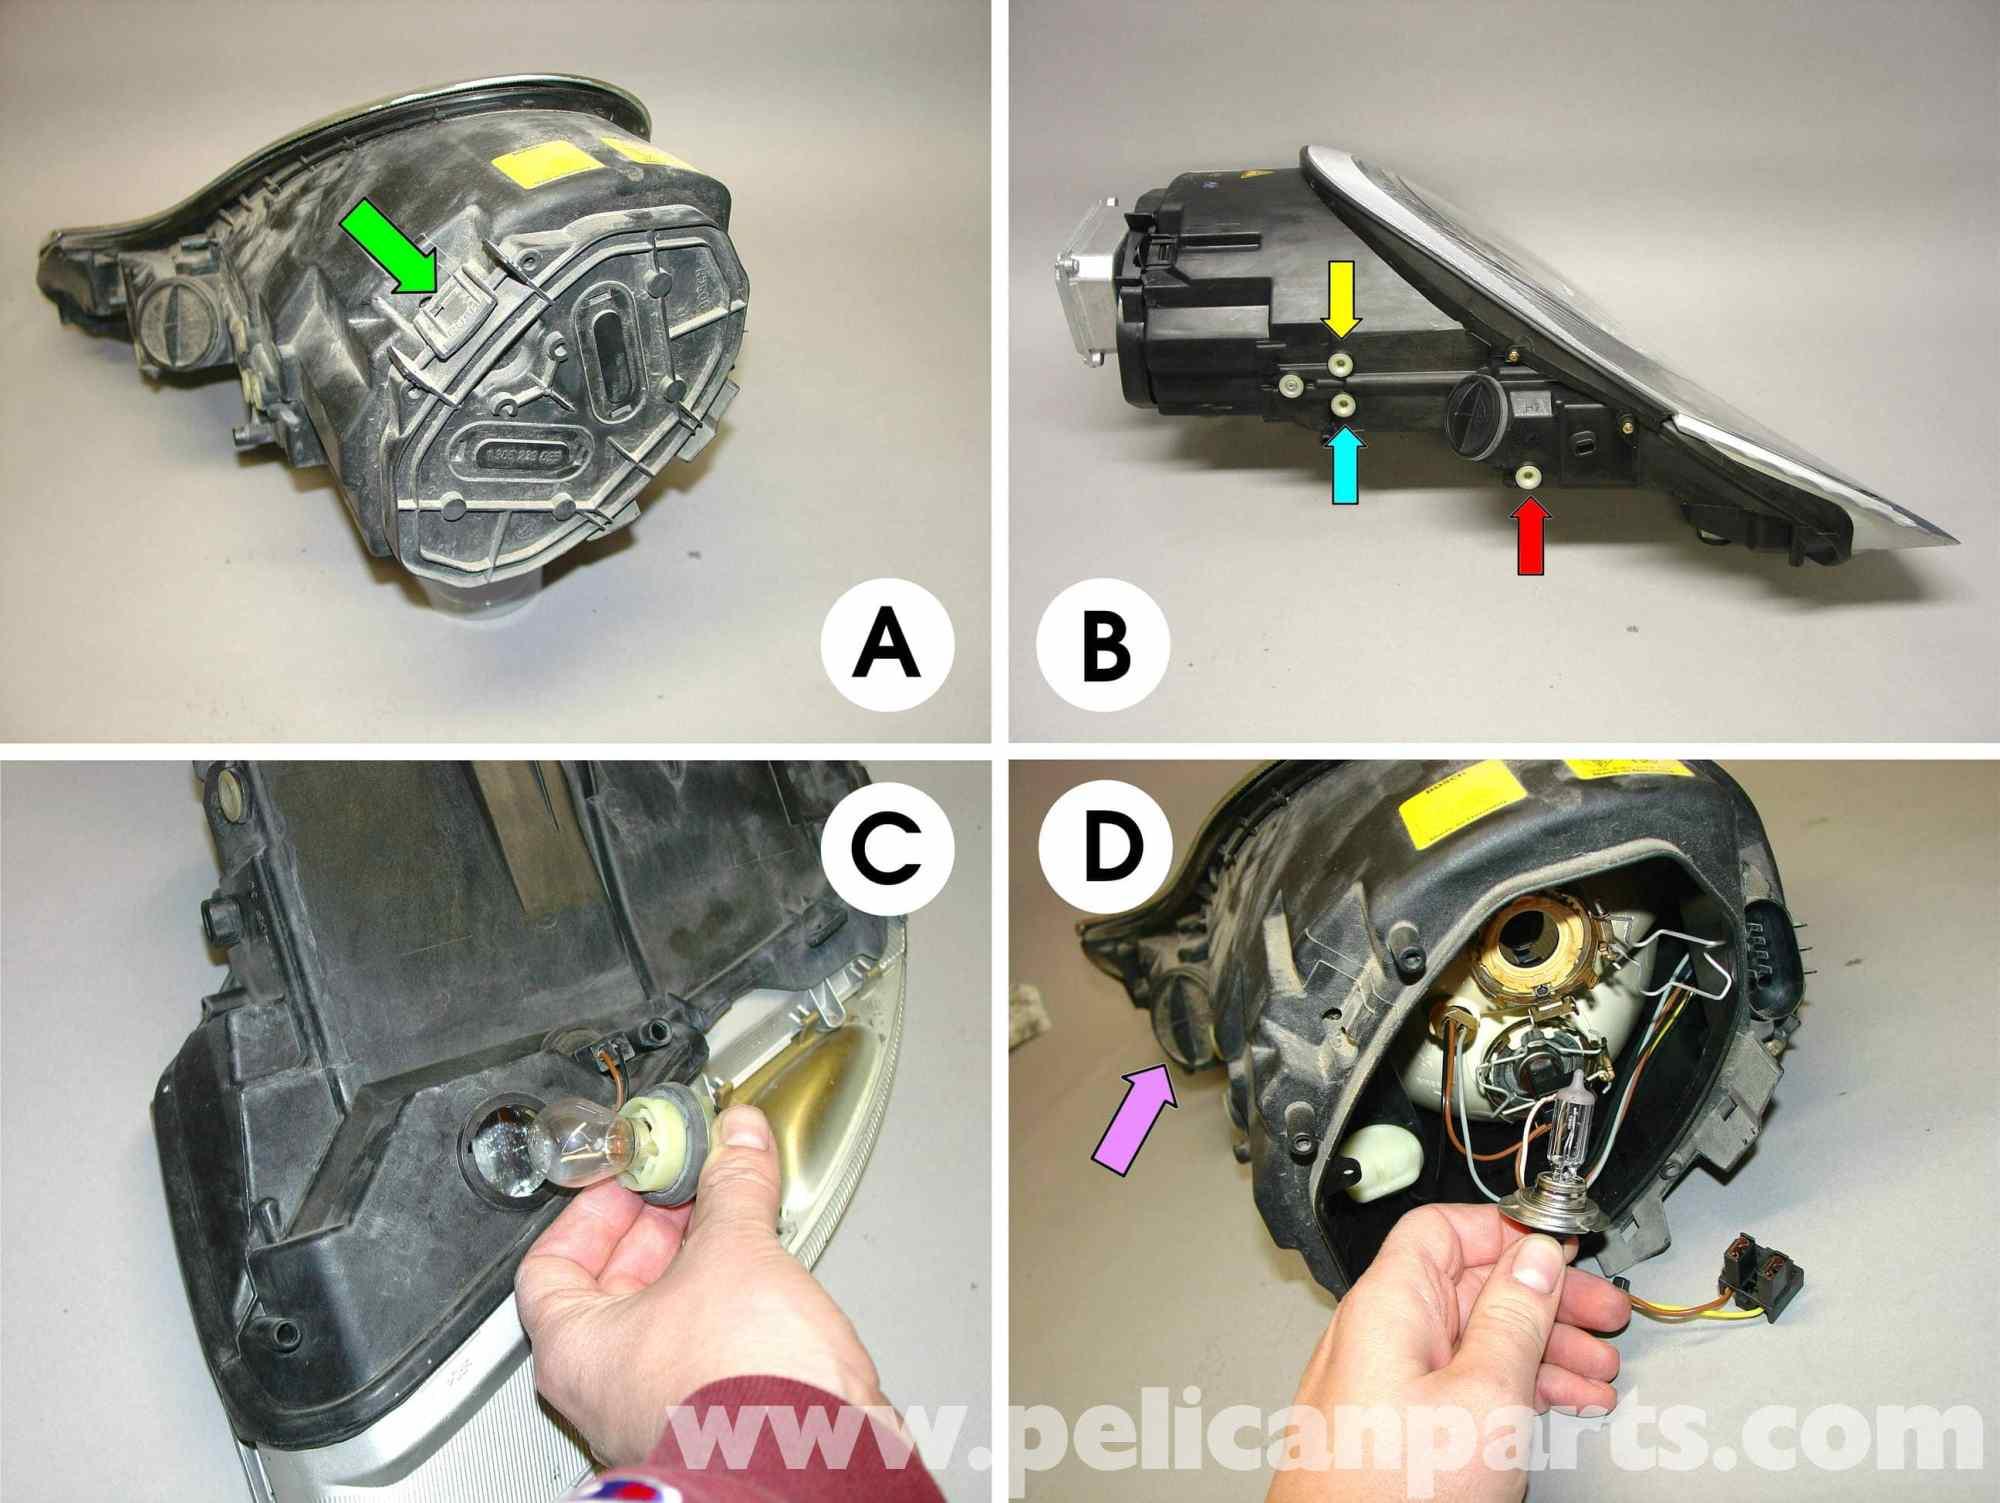 hight resolution of porsche 997 headlight wiring diagram wiring diagram international 4700 fuse panel diagram porsche 2006 997 carrera